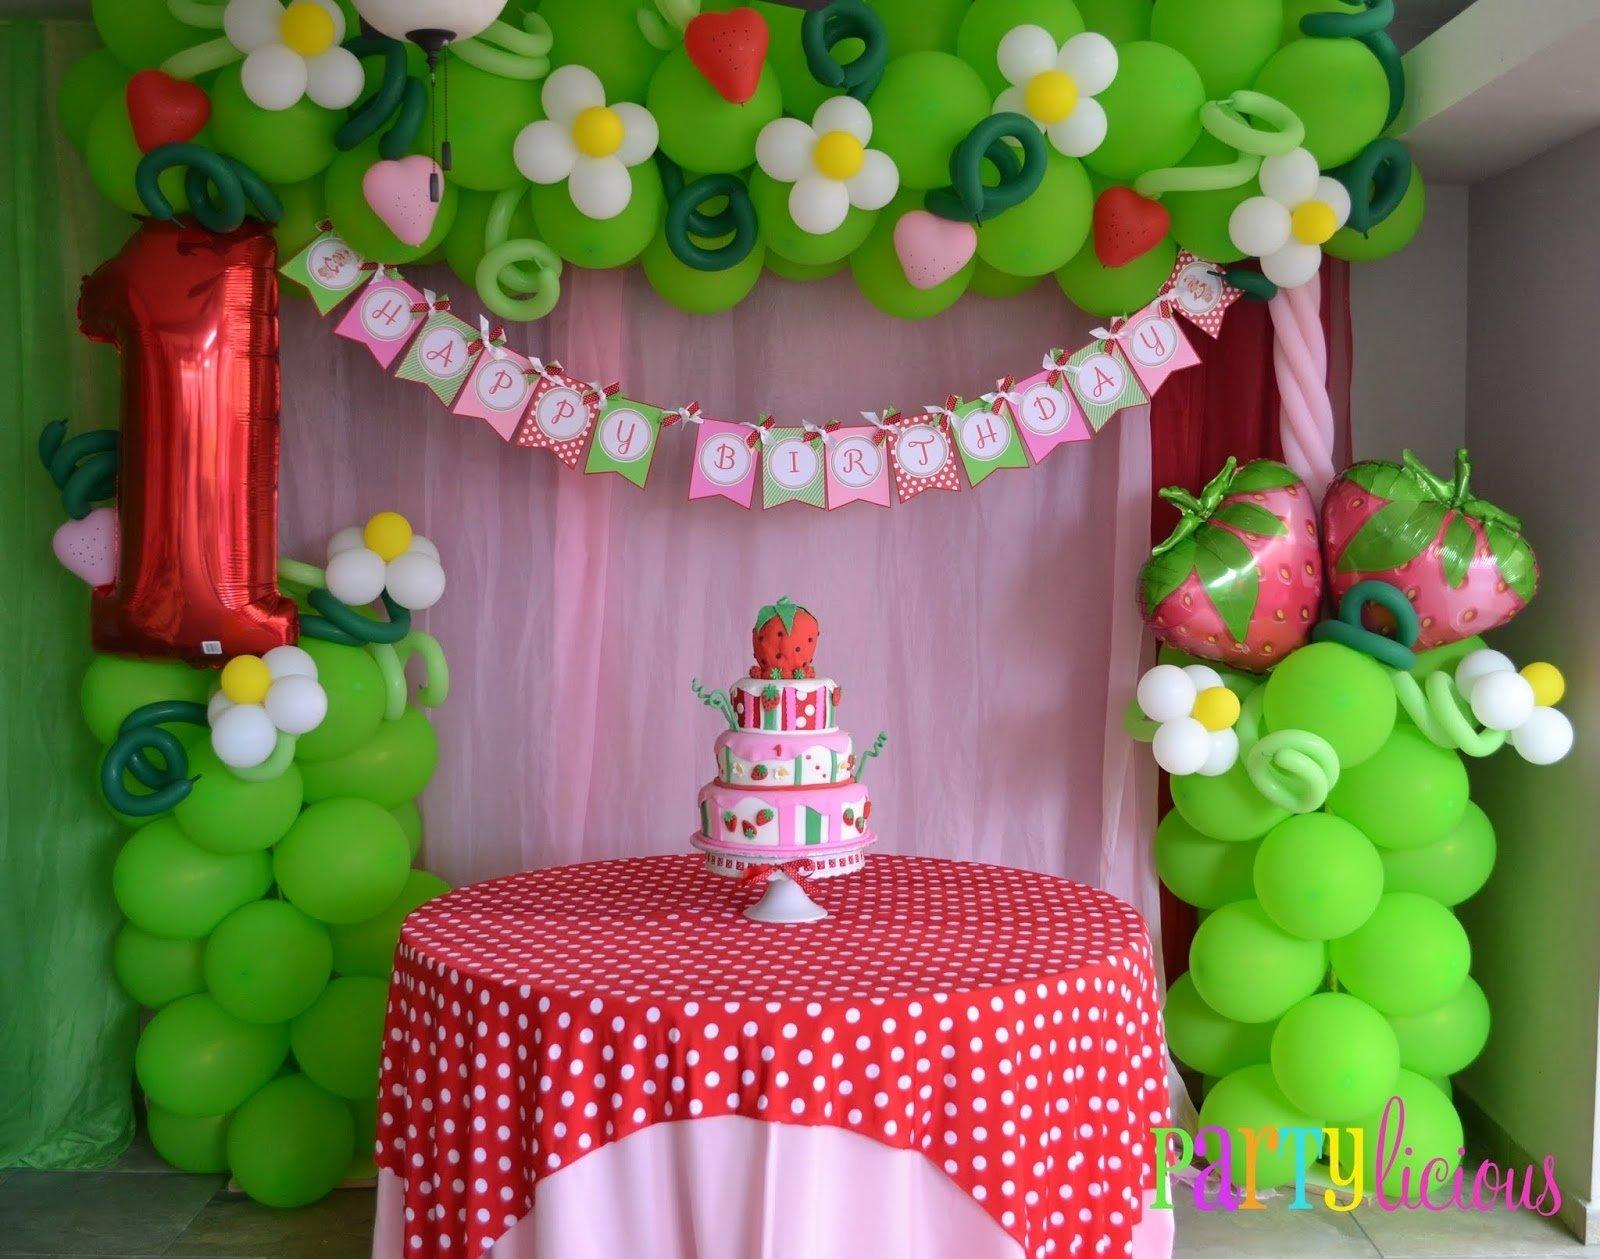 balloon idea, minus the #1 {vintage strawberry shortcake birthday